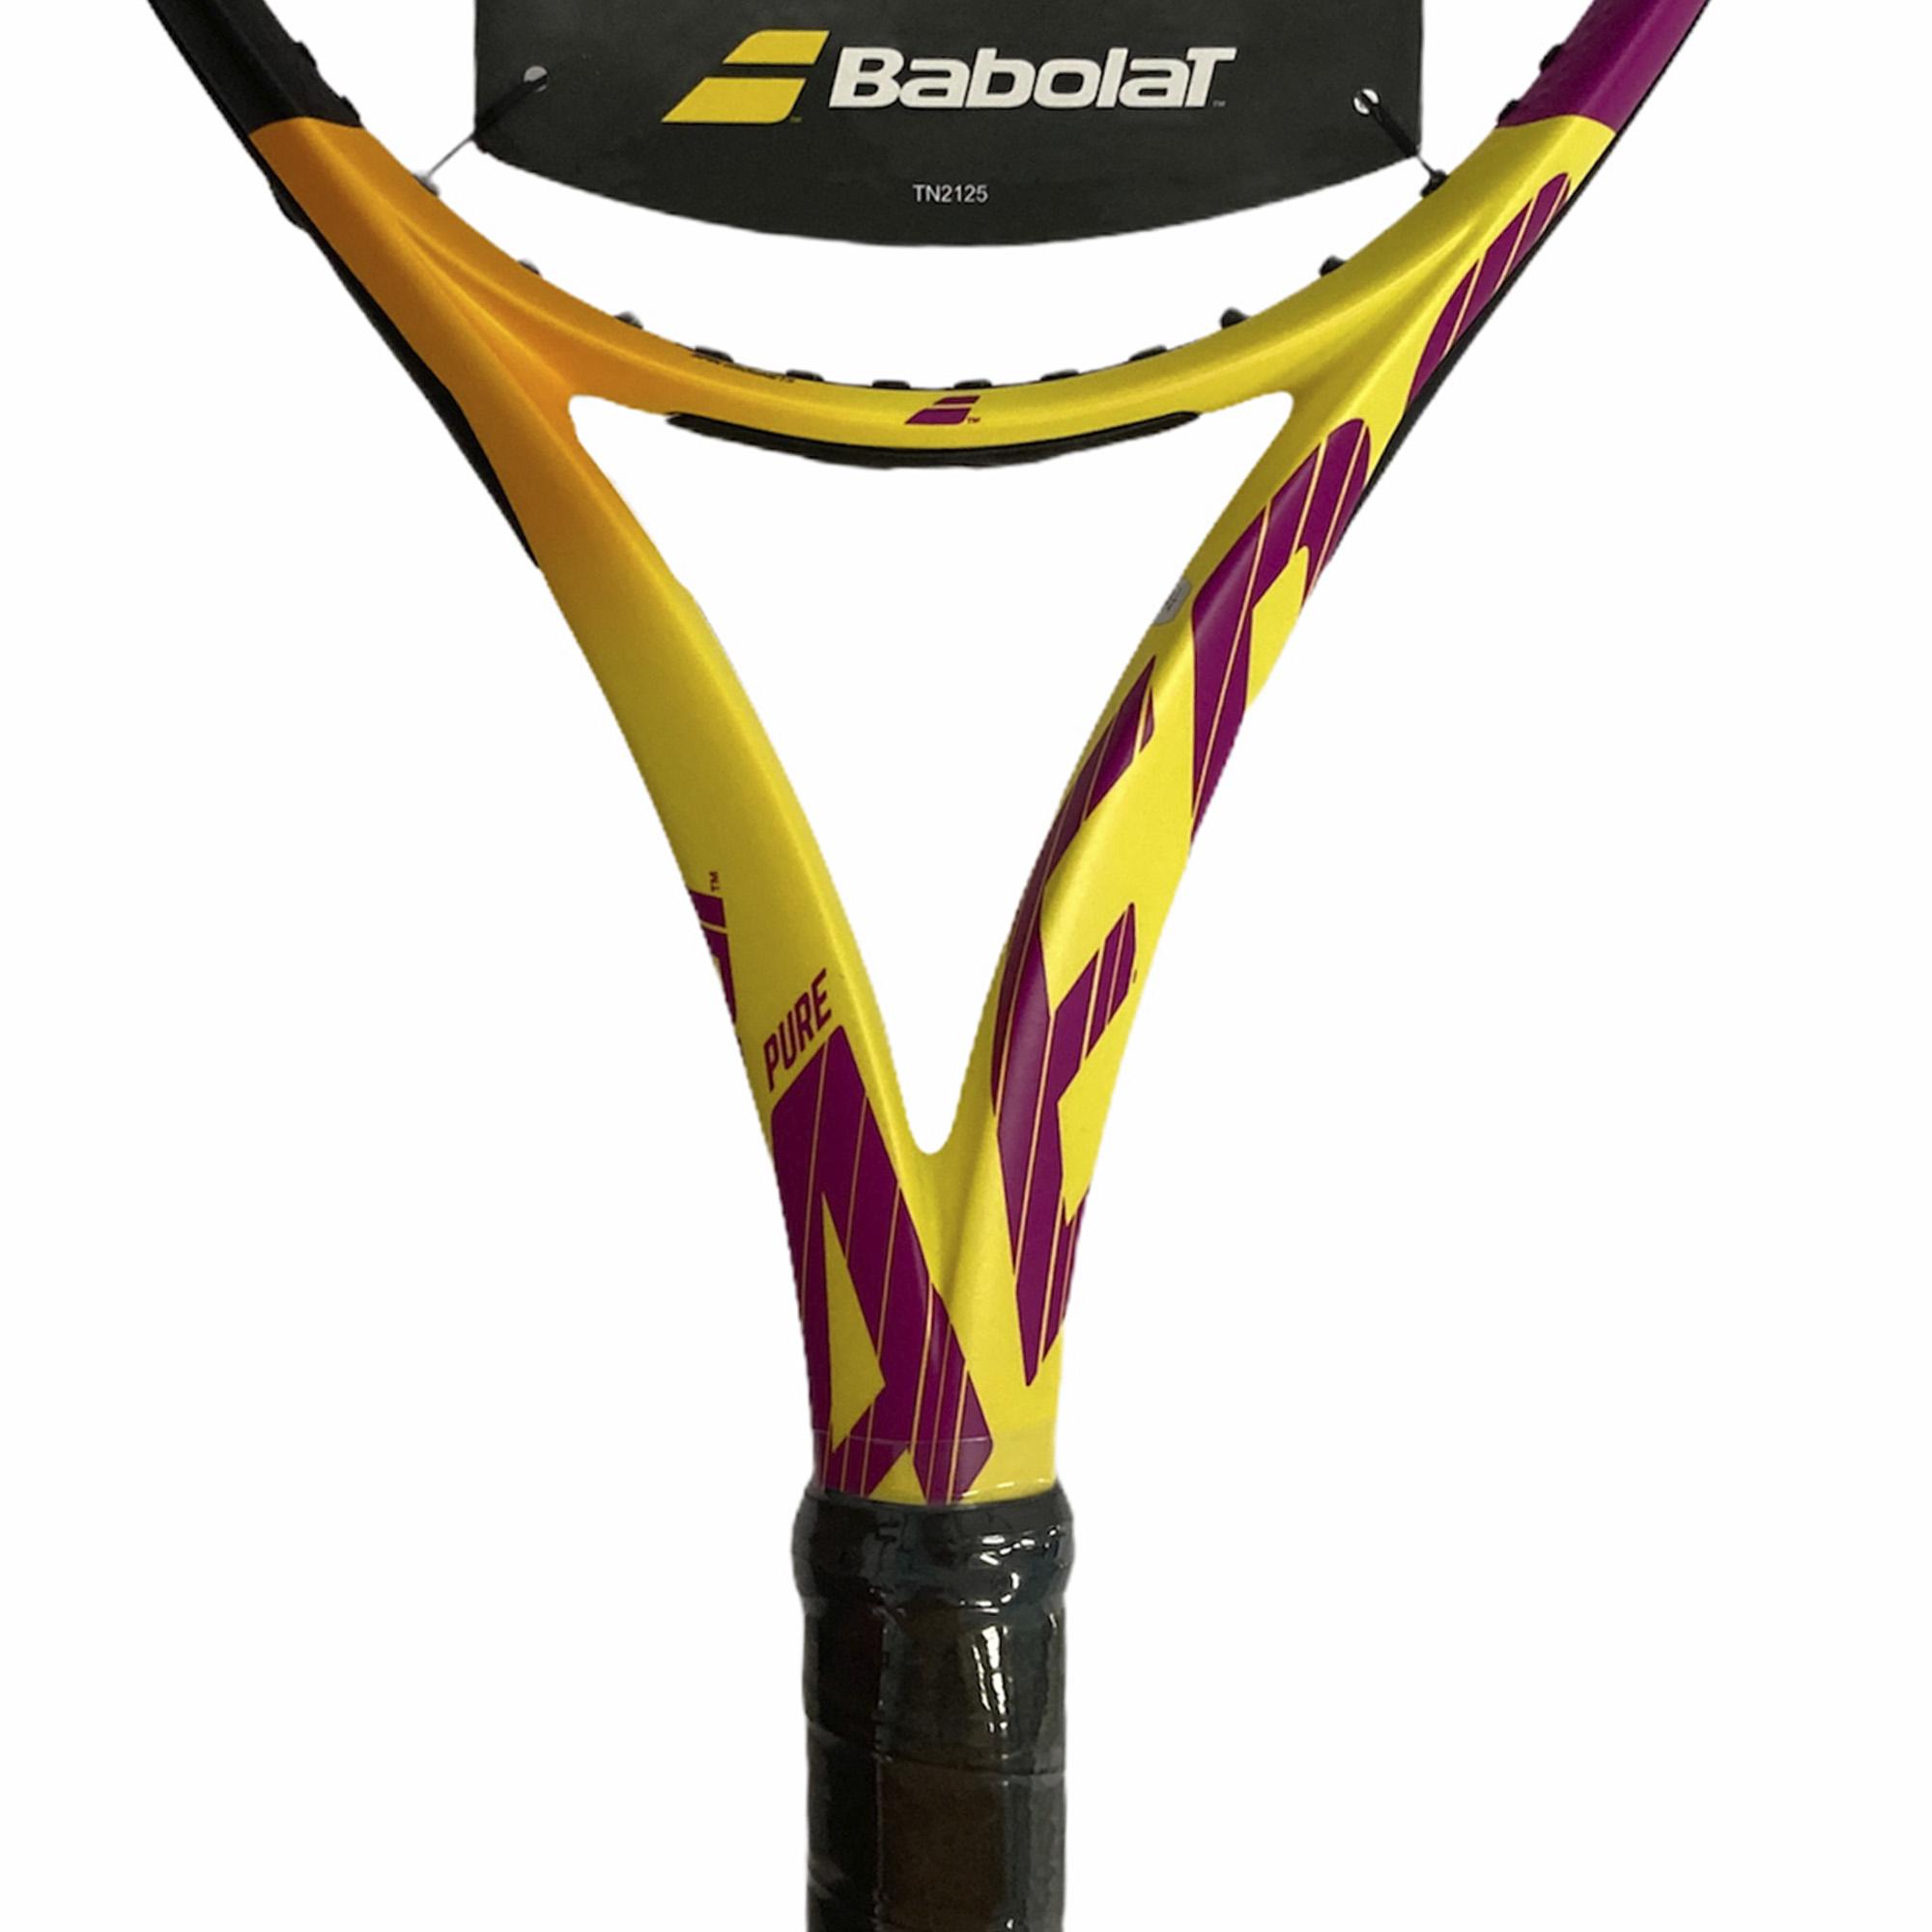 Raquete de Tênis Babolat Pure Aero Rafa 300g